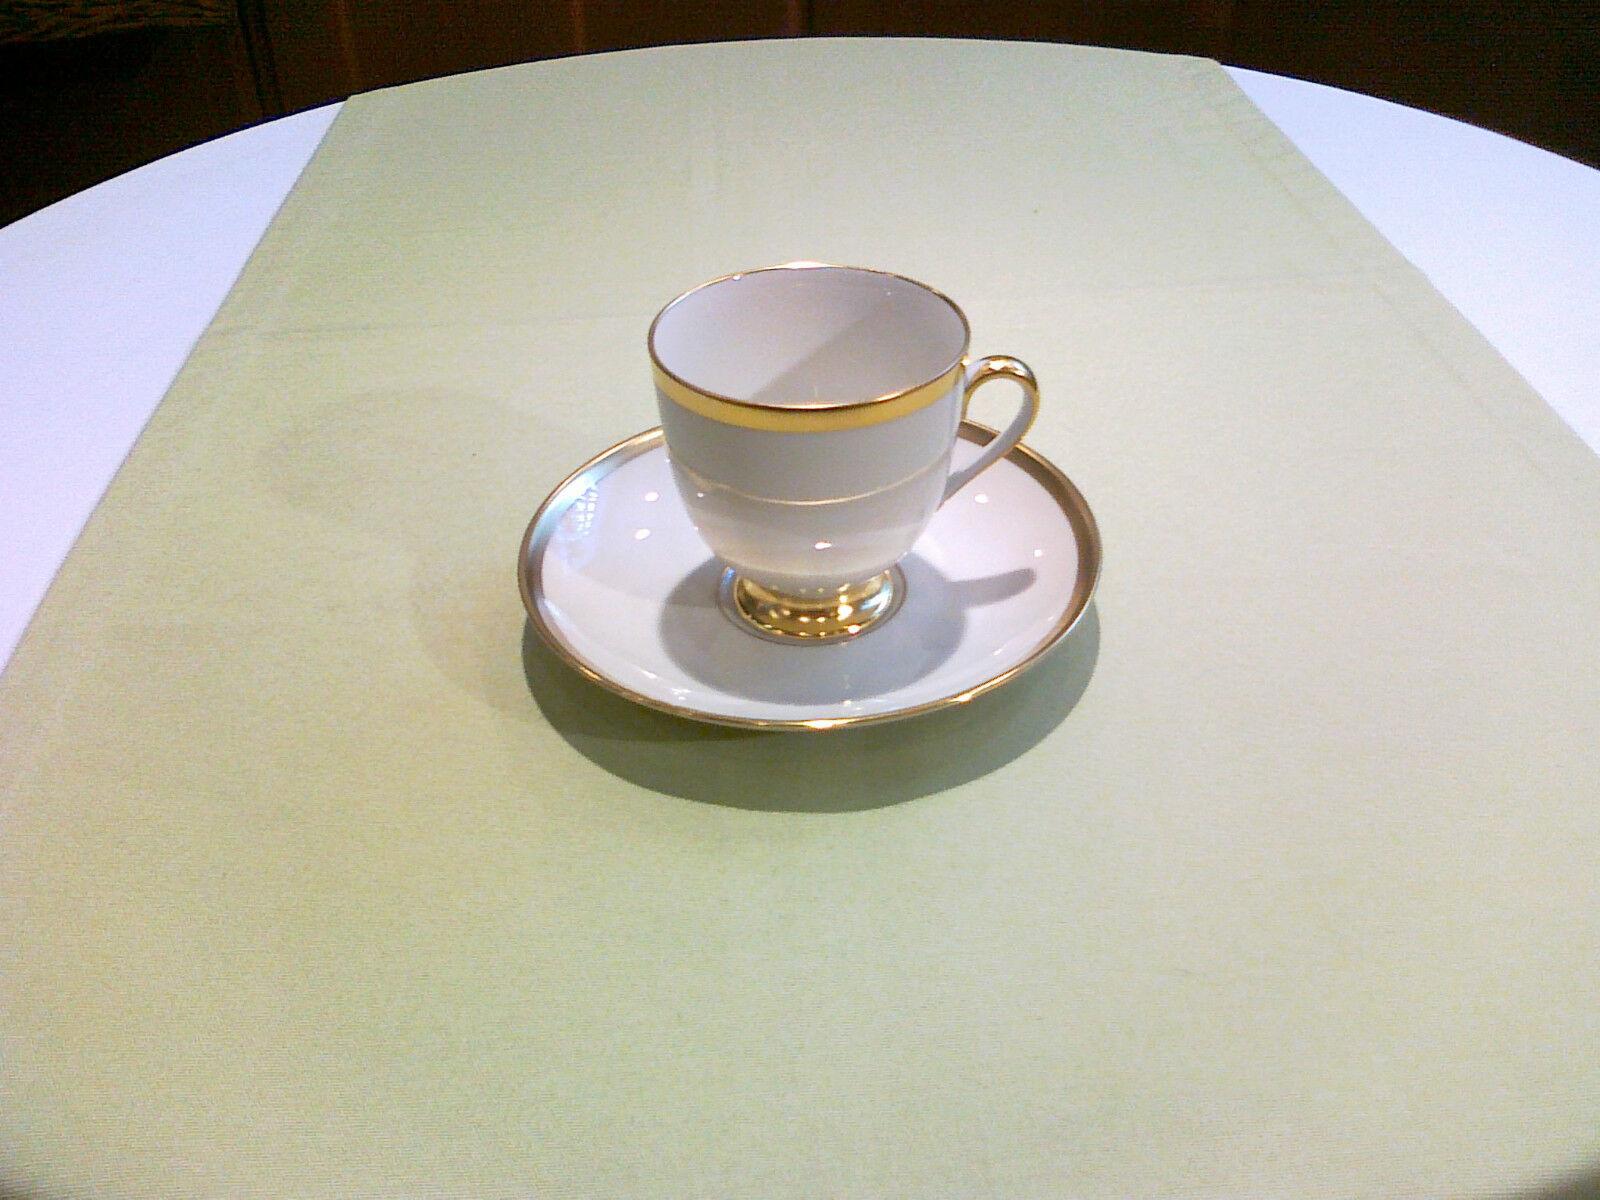 Furstenberg-Porcelaine-Princesse 1650 Tasse à Café 2tlg. - Neuf